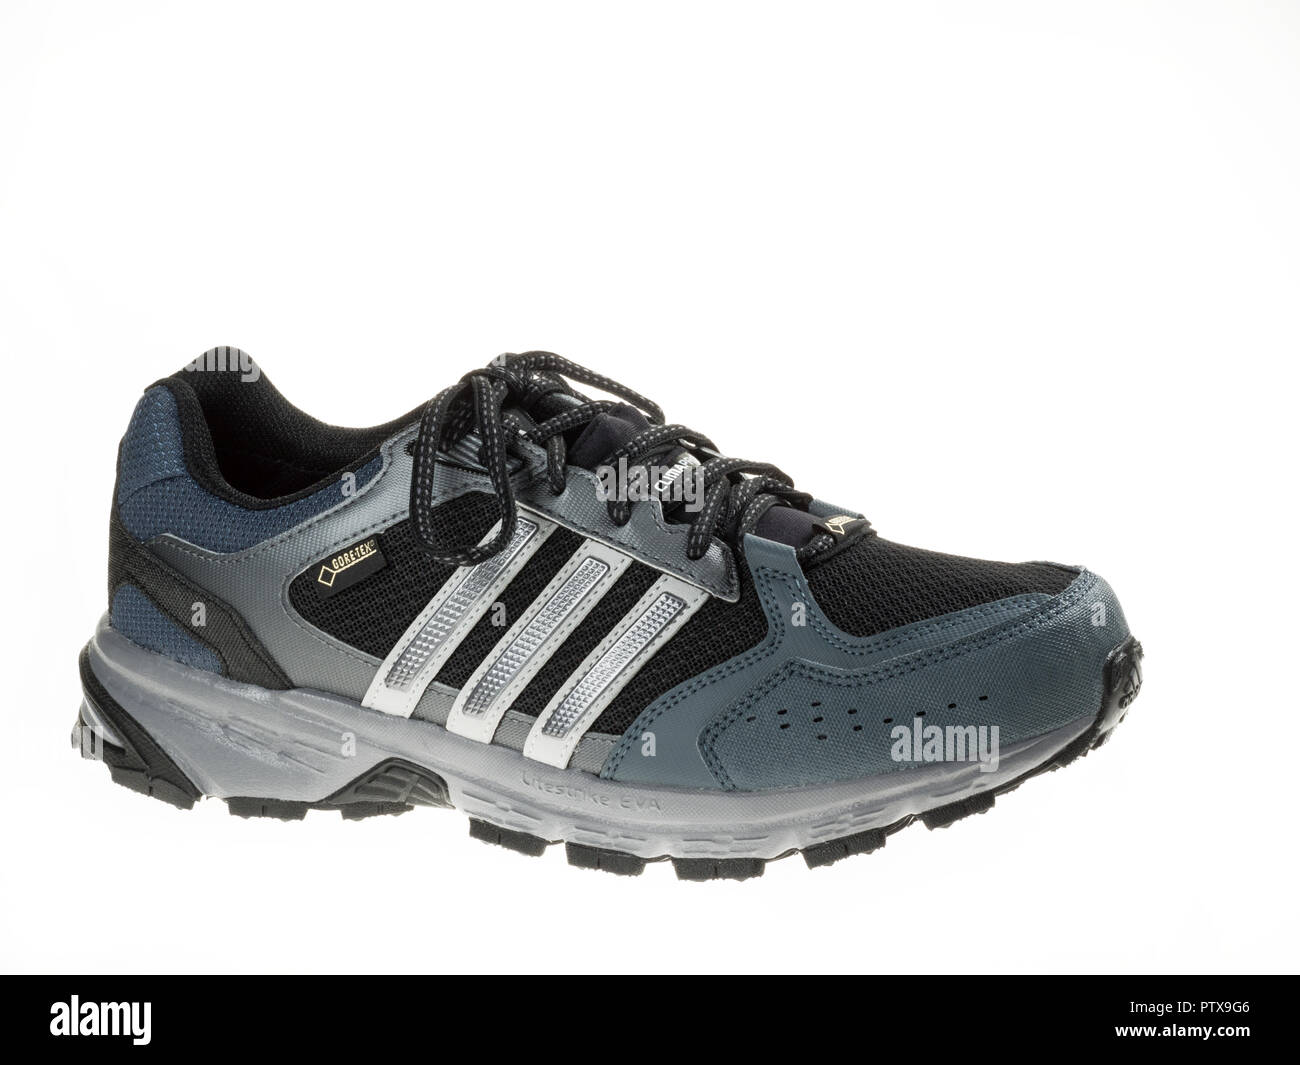 29 2014 Januar Istanbul Iyx1fqe Im Adidas Outdoor Neue Schuhe Türkei NnOym8wv0